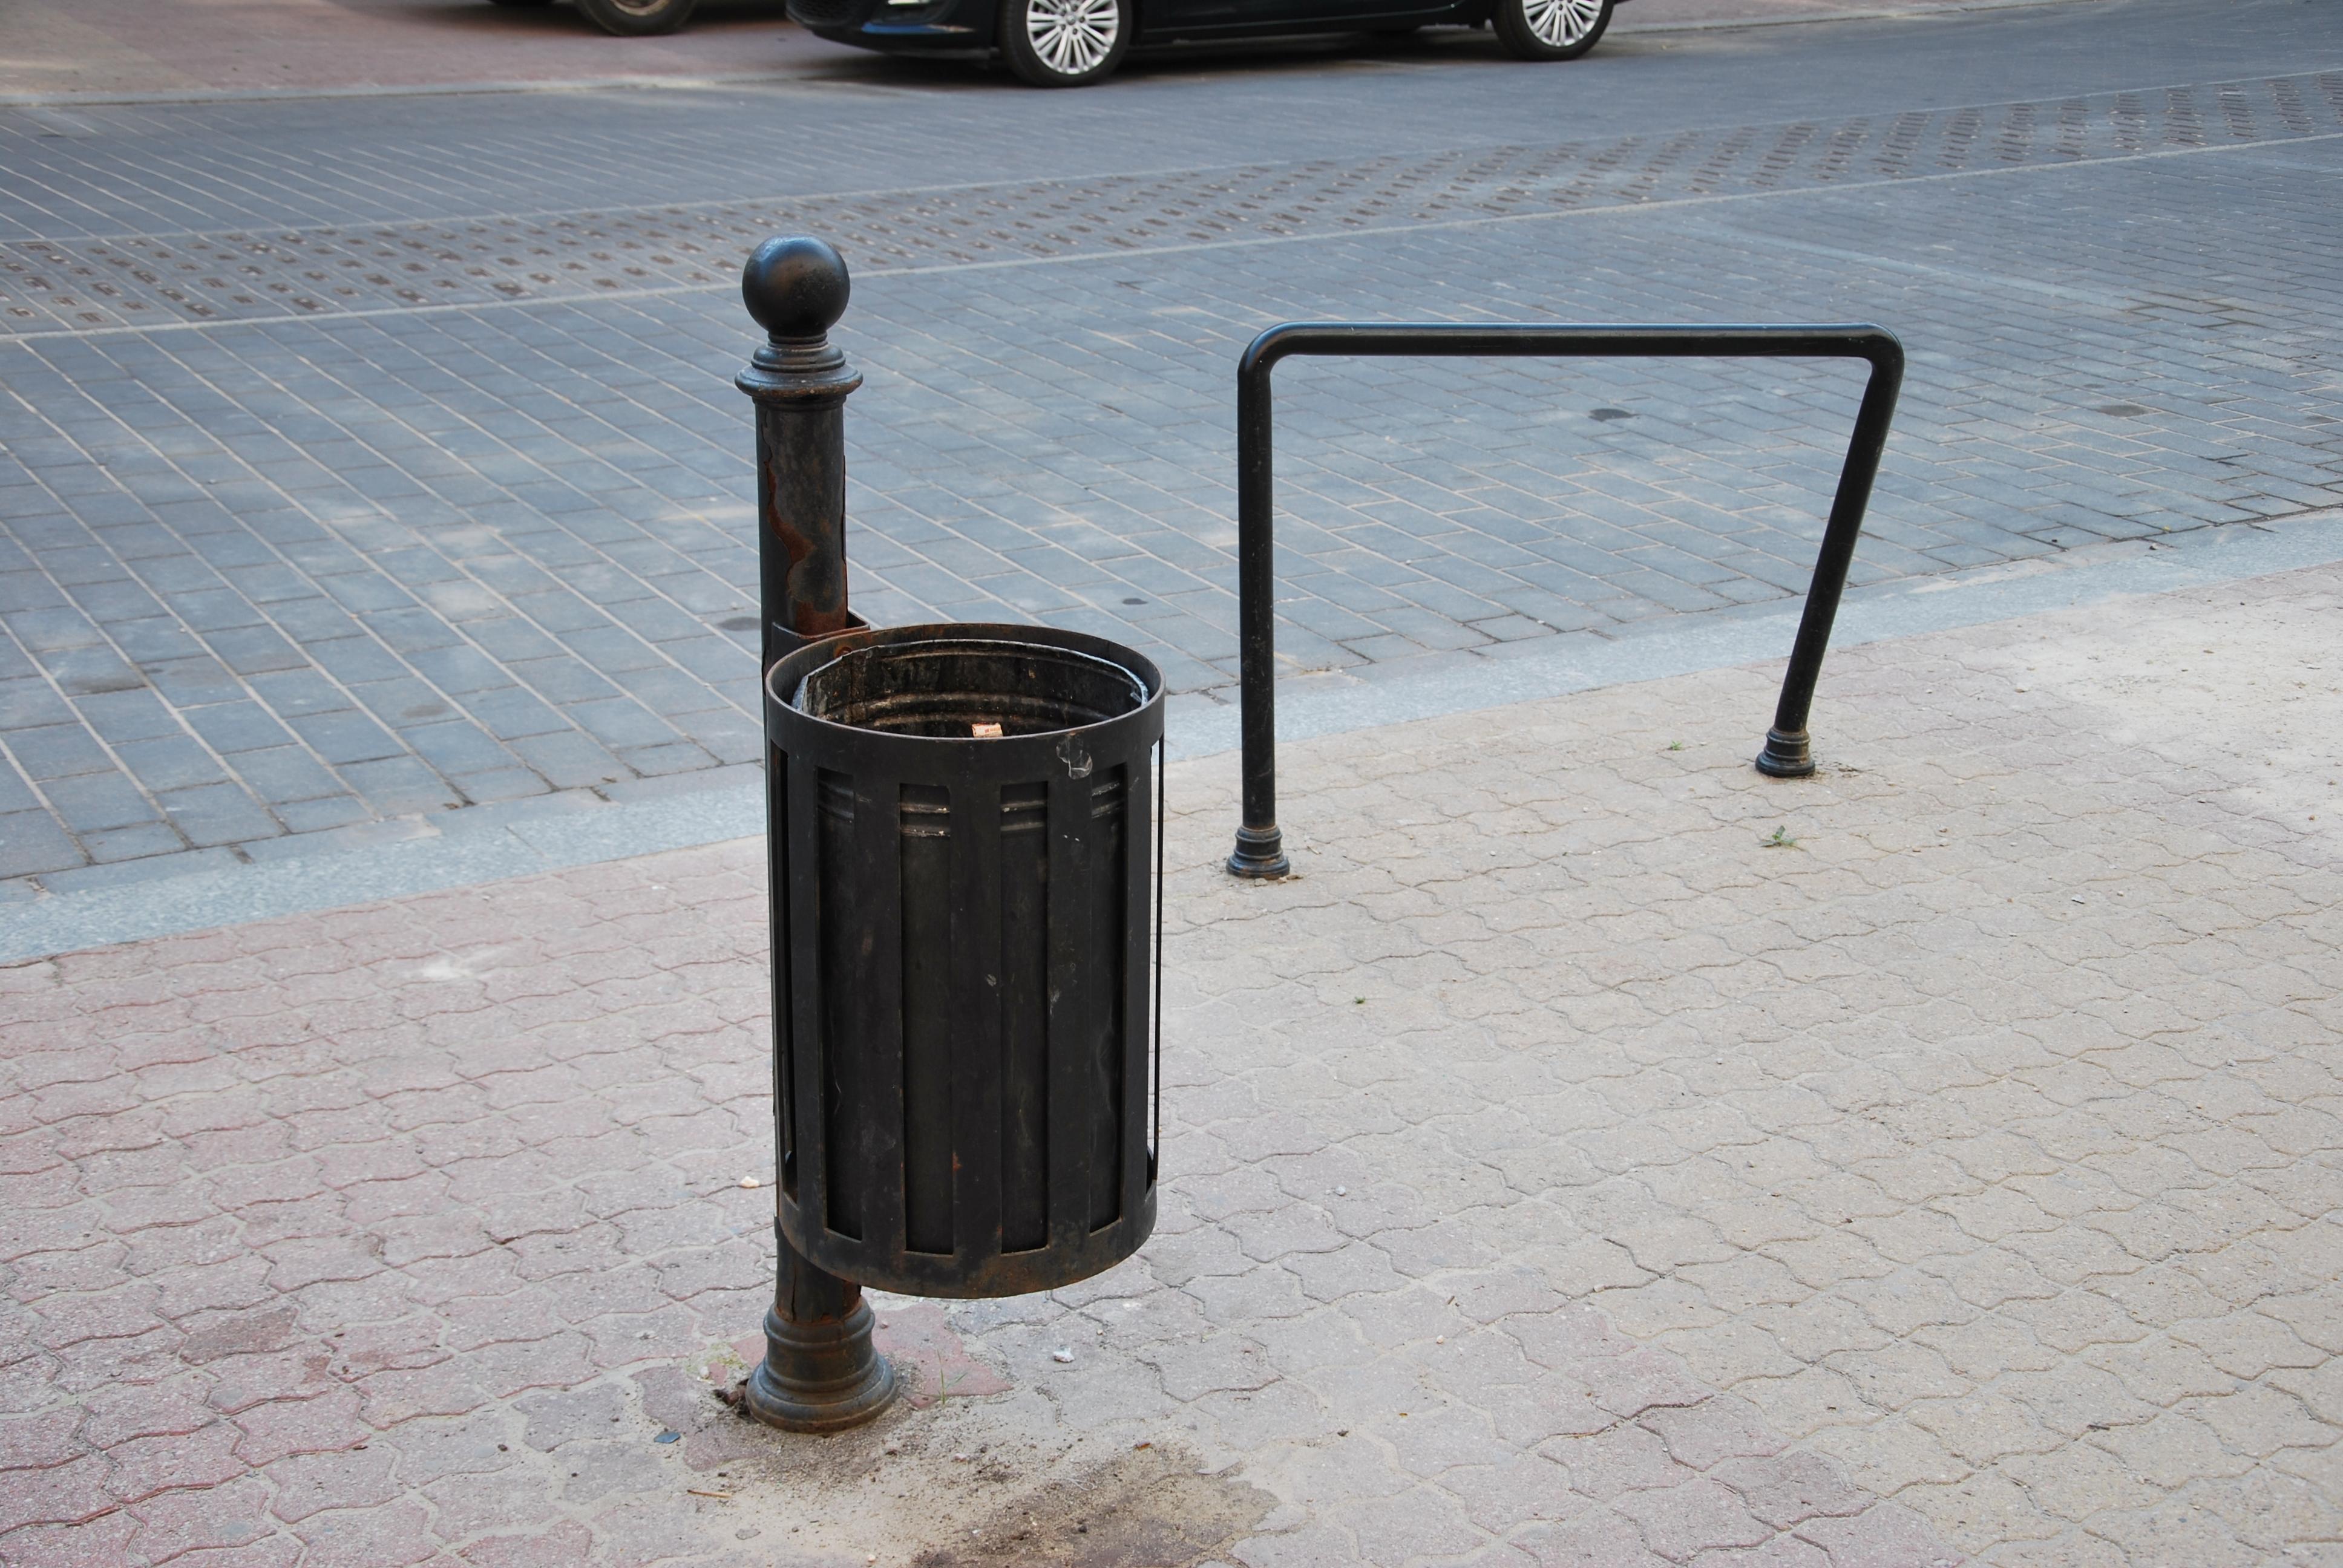 File:Old Street Furniture, Łódź Piotrkowska Street